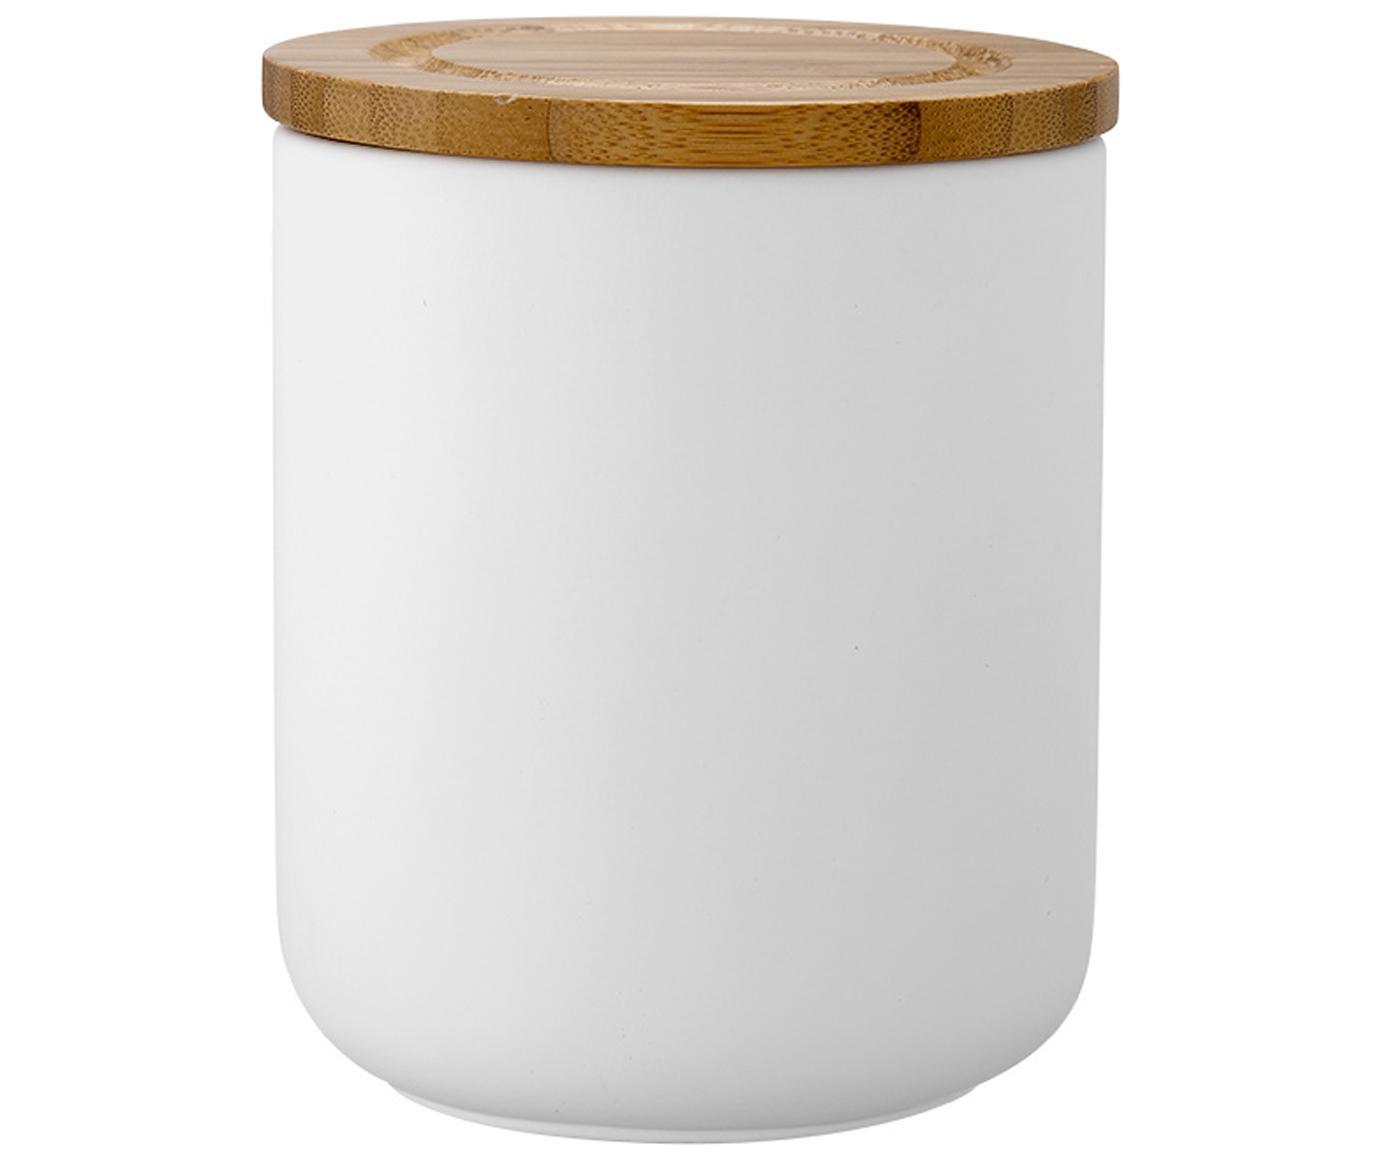 Aufbewahrungsdose Stak, Dose: Keramik, Deckel: Bambusholz, Weiss, Bambus, Ø 10 x H 13 cm